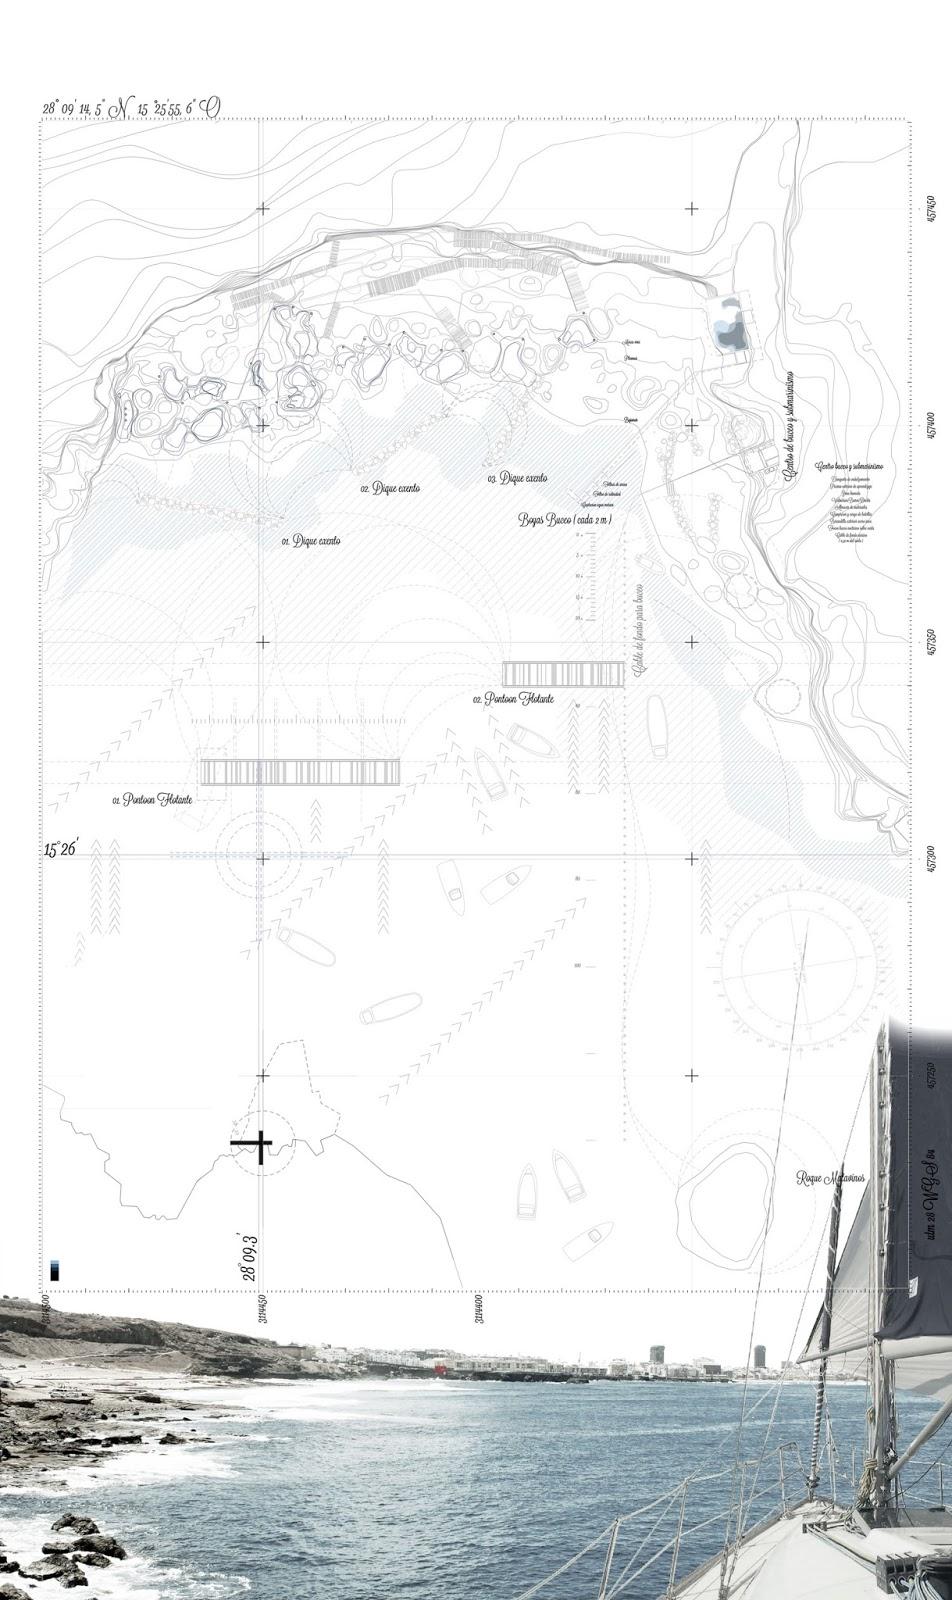 Piscinas de Pleamar Landscape Hydrothermal Center David-del-Valls-PFC